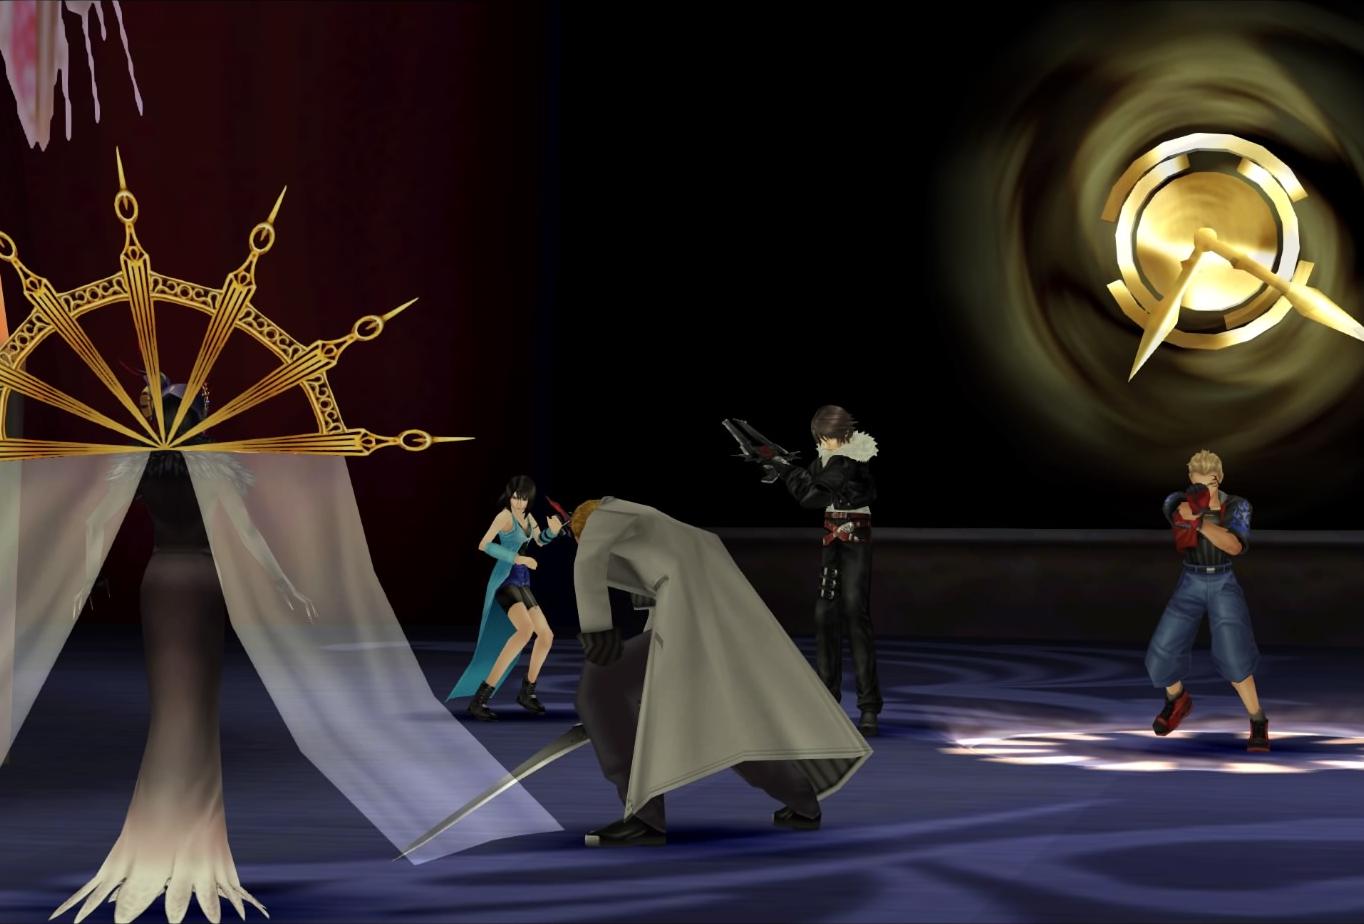 Haste (Final Fantasy VIII)